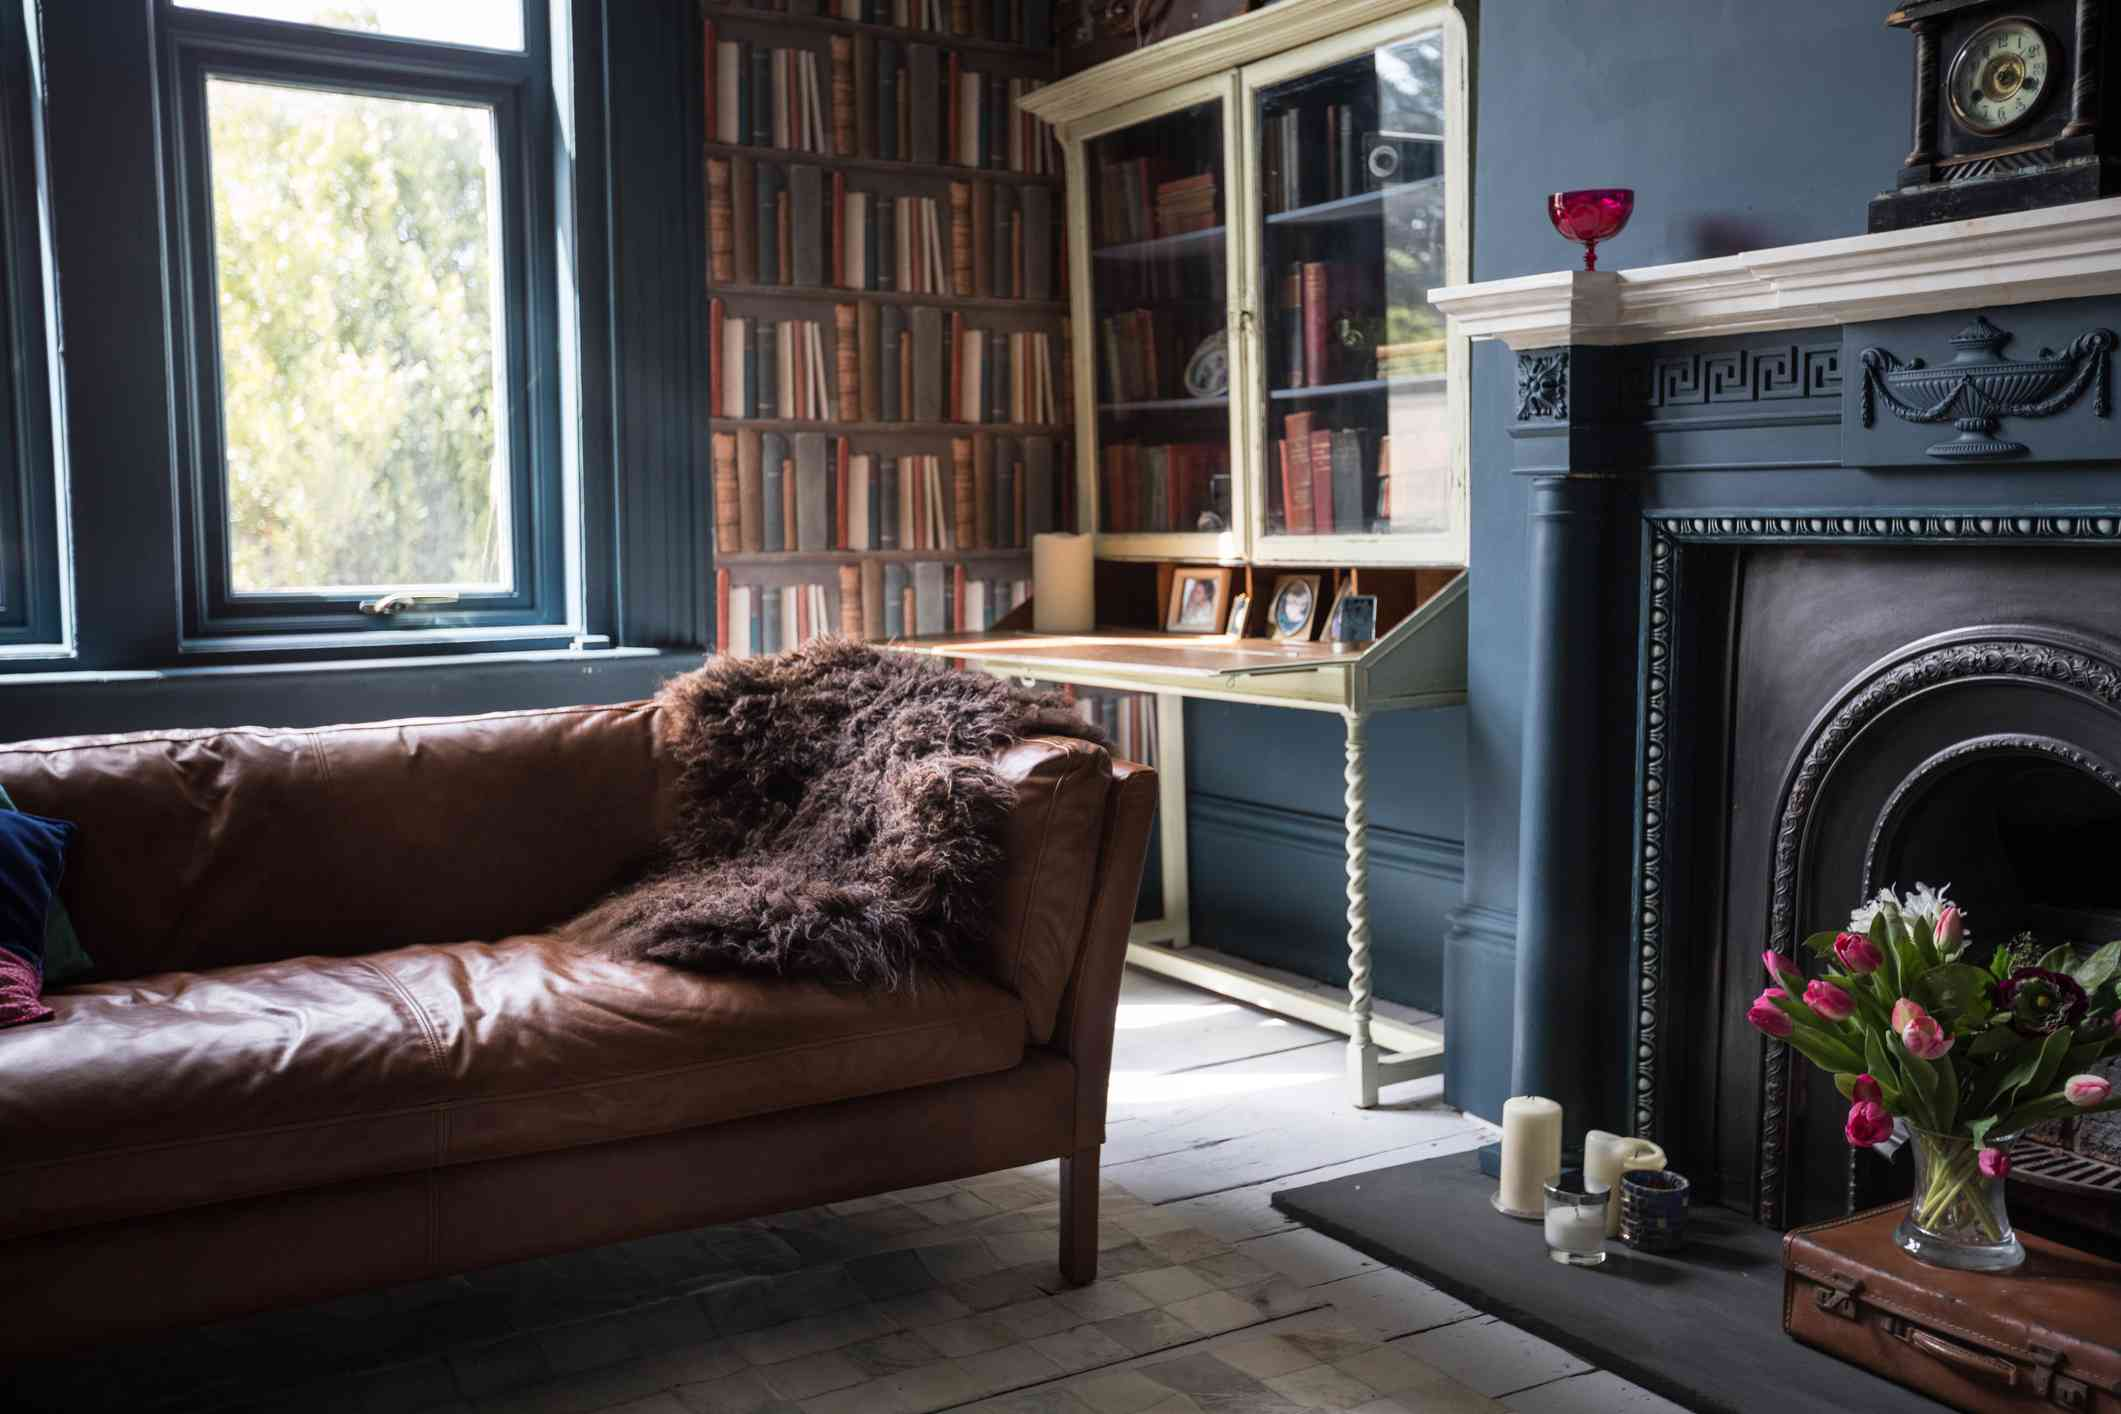 Cozy British living room